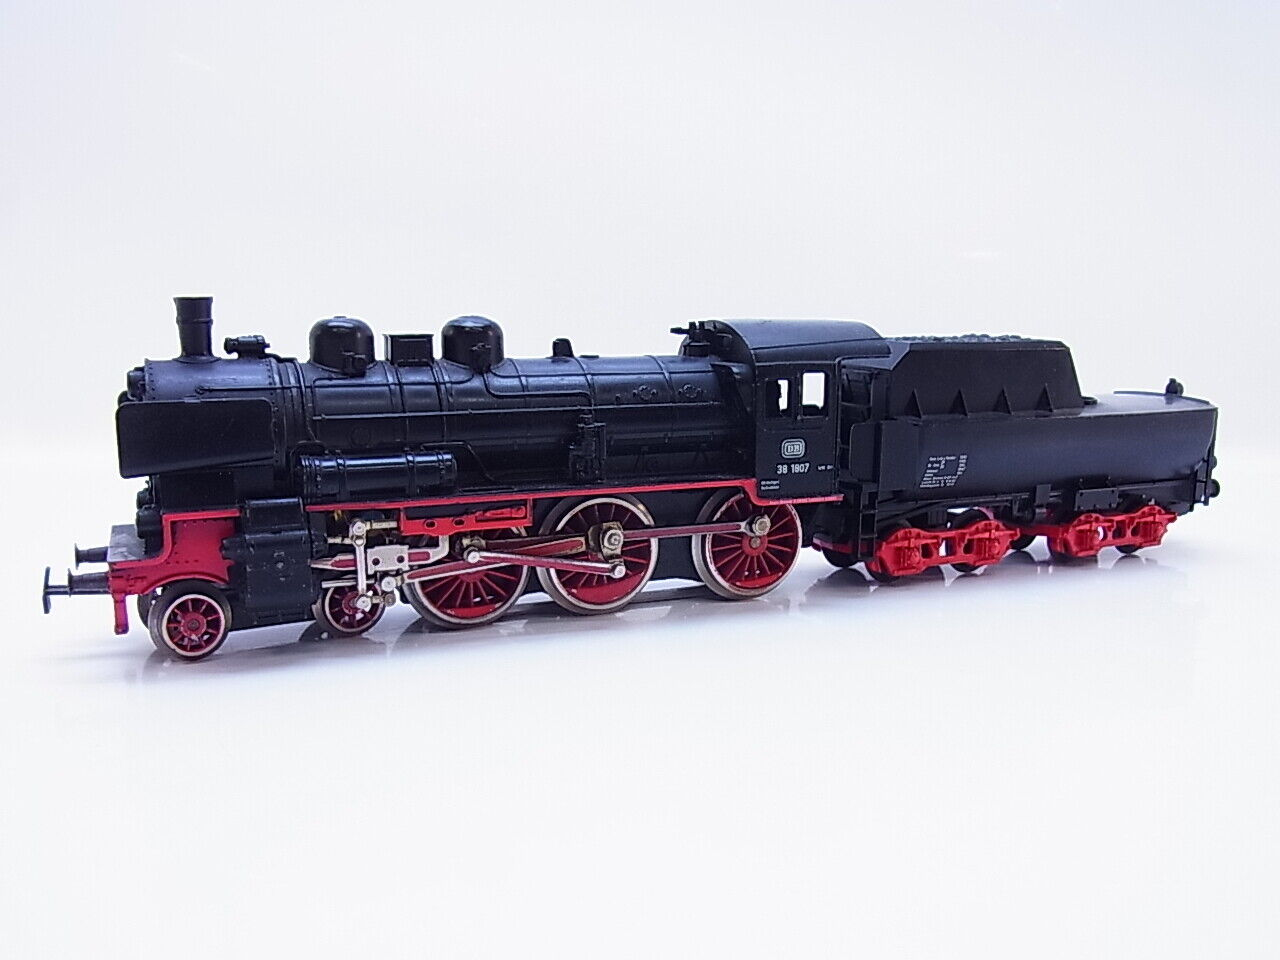 Lot 58066   Märklin h0 3098 locomotiva con tender BR 38 delle DB pronto di guida